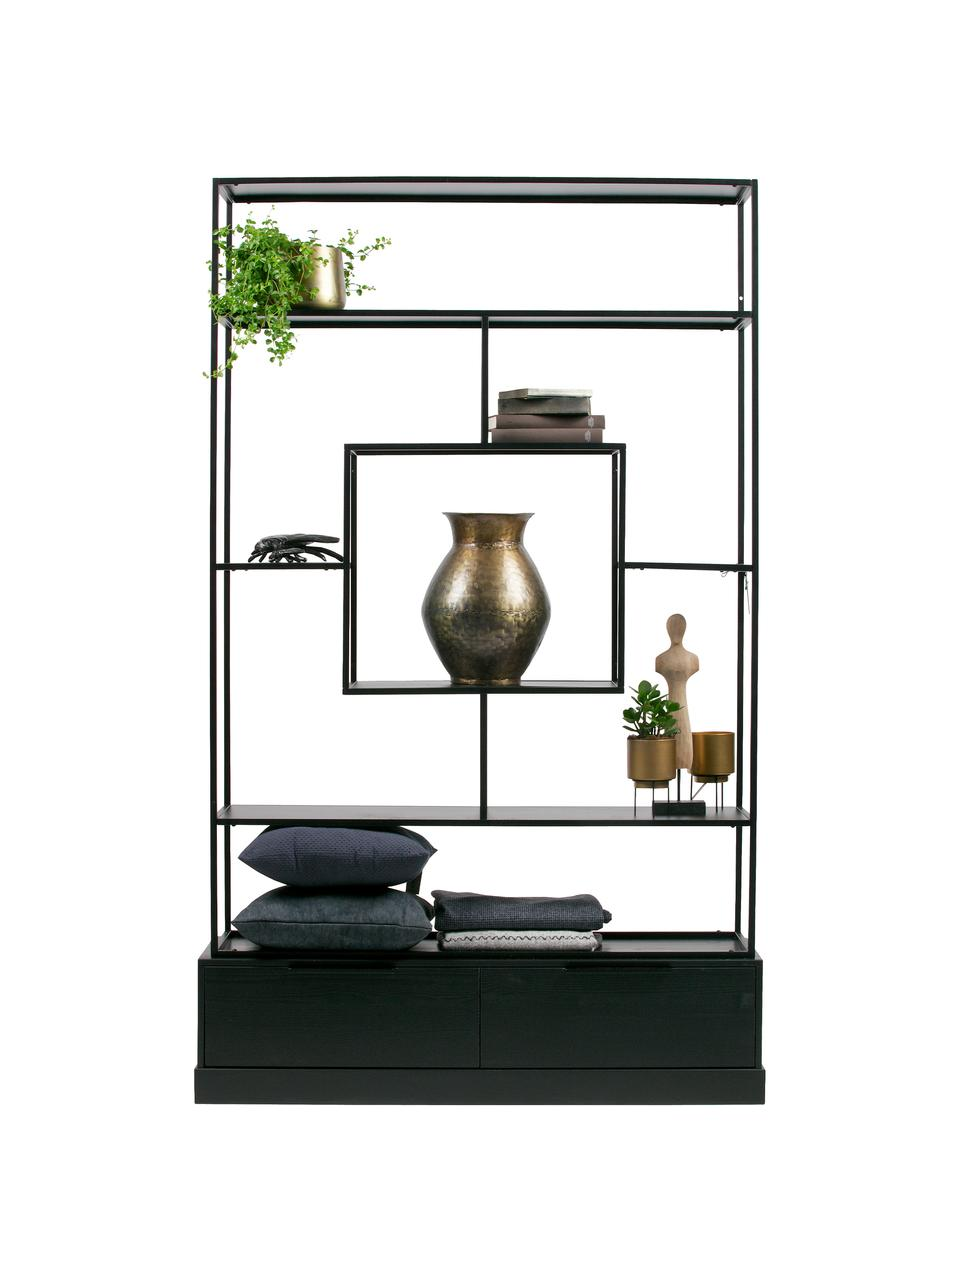 Metall-Standregal Fons mit Stauraum, Rahmen: Metall, lackiert, Schwarz, 126 x 204 cm